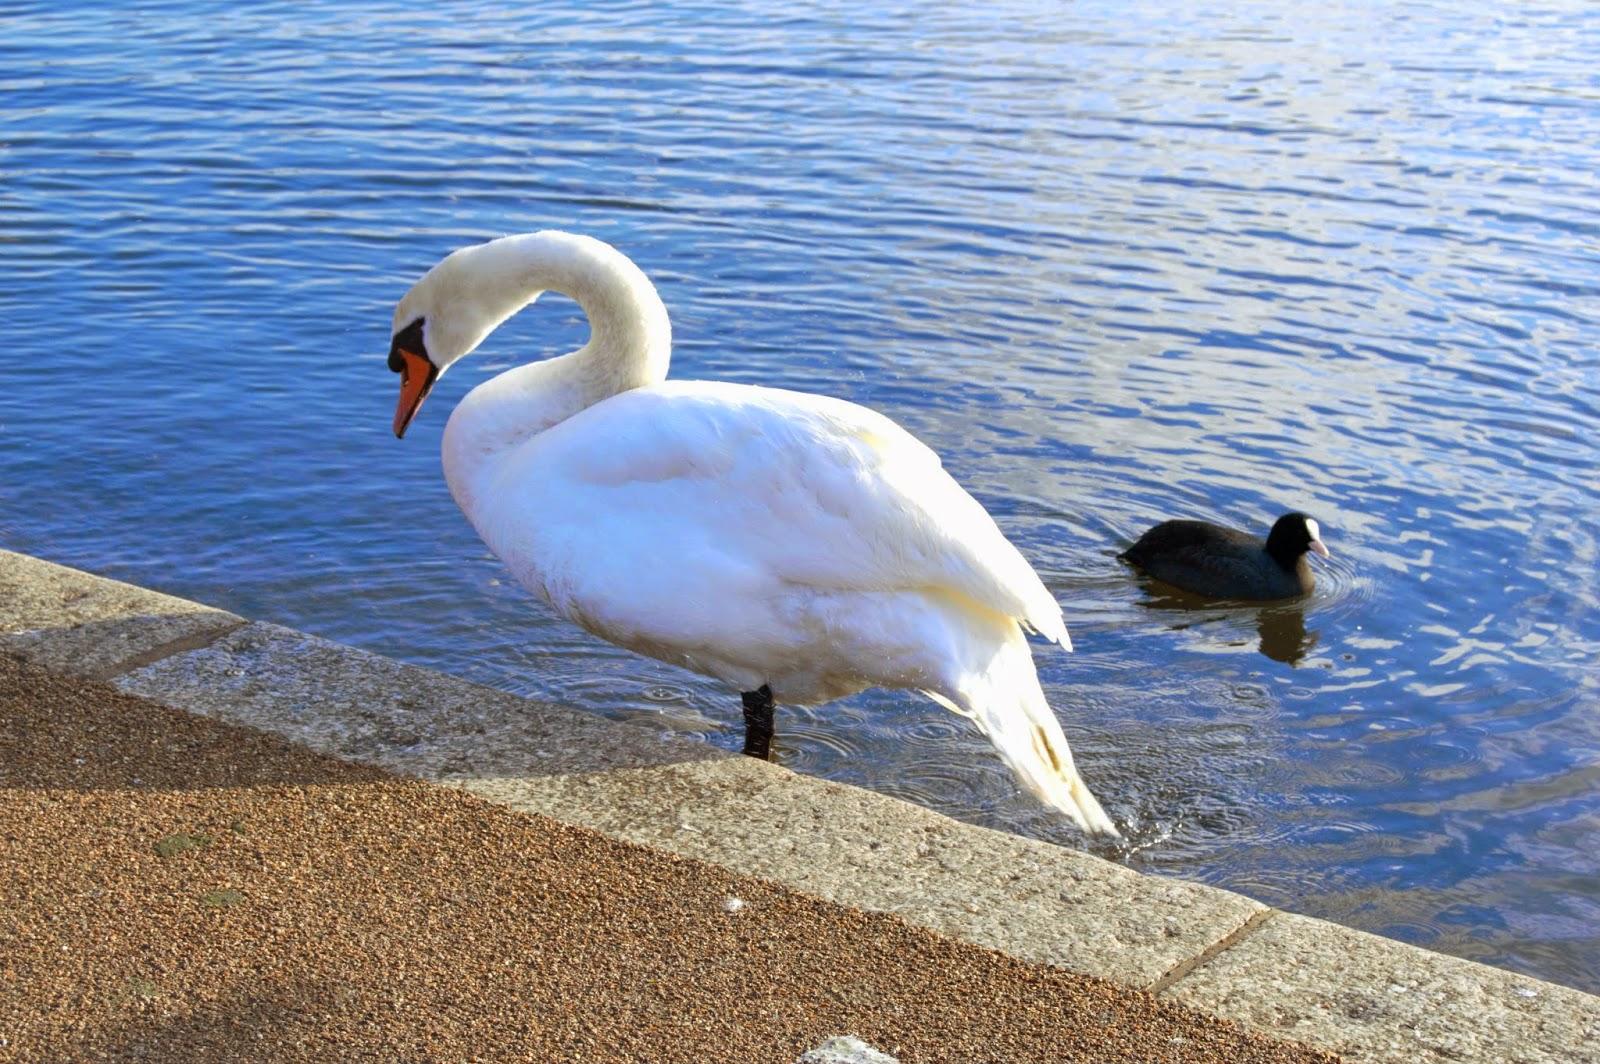 Swan in Kensington Gardens